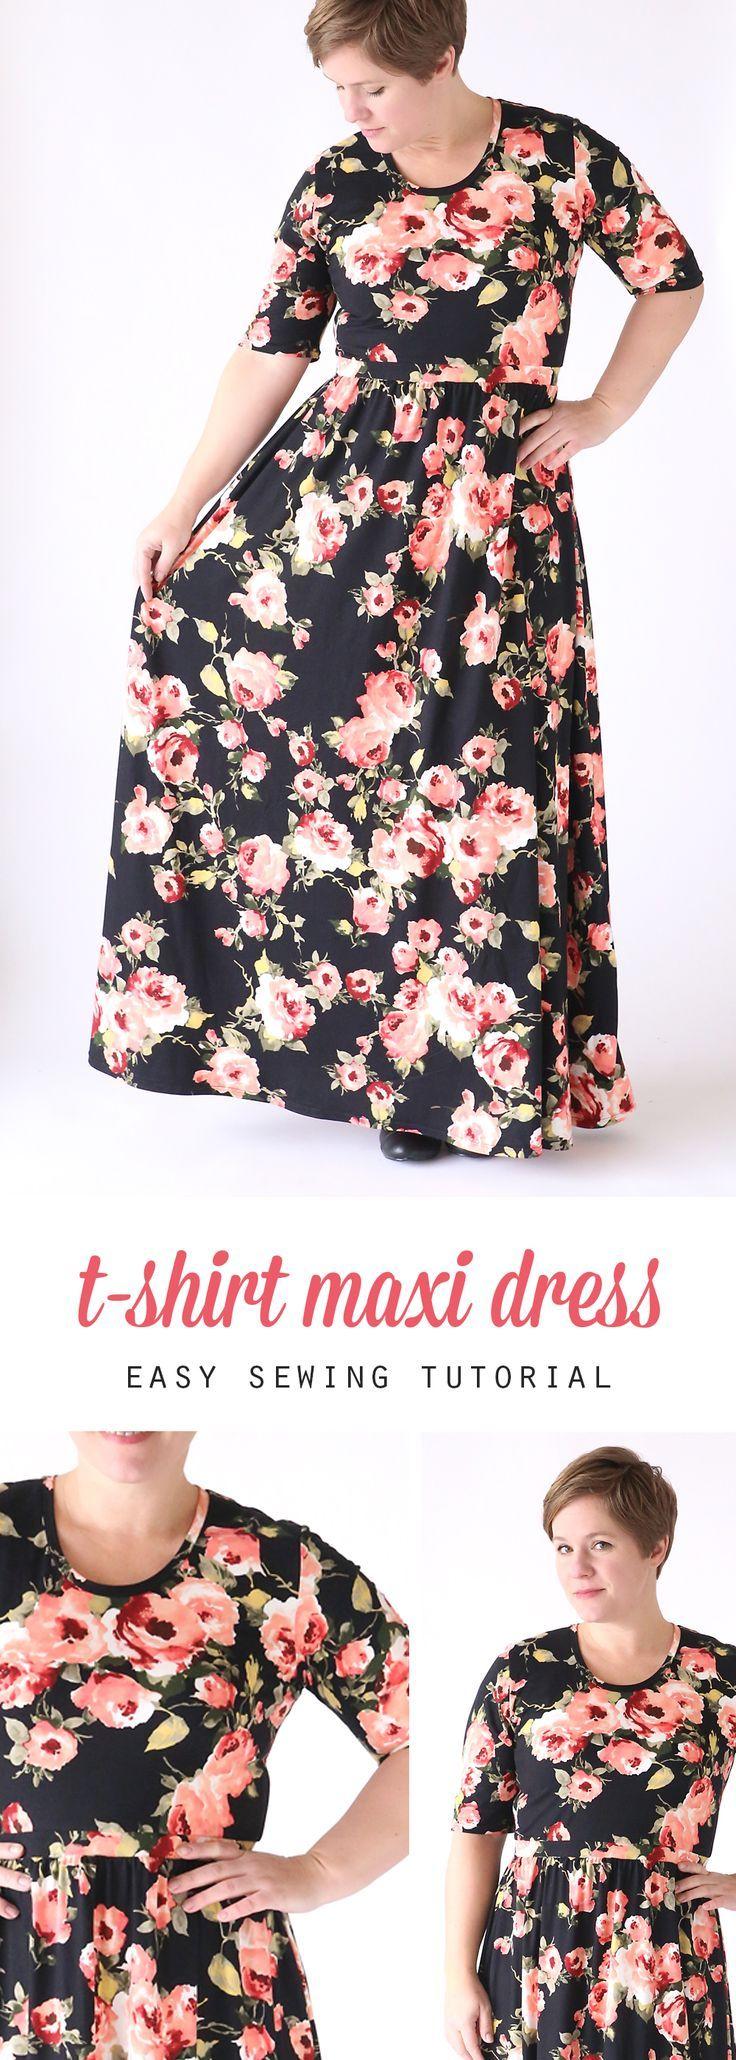 the classic tee maxi dress | Maxi dresses, Tee shirt and Tutorials